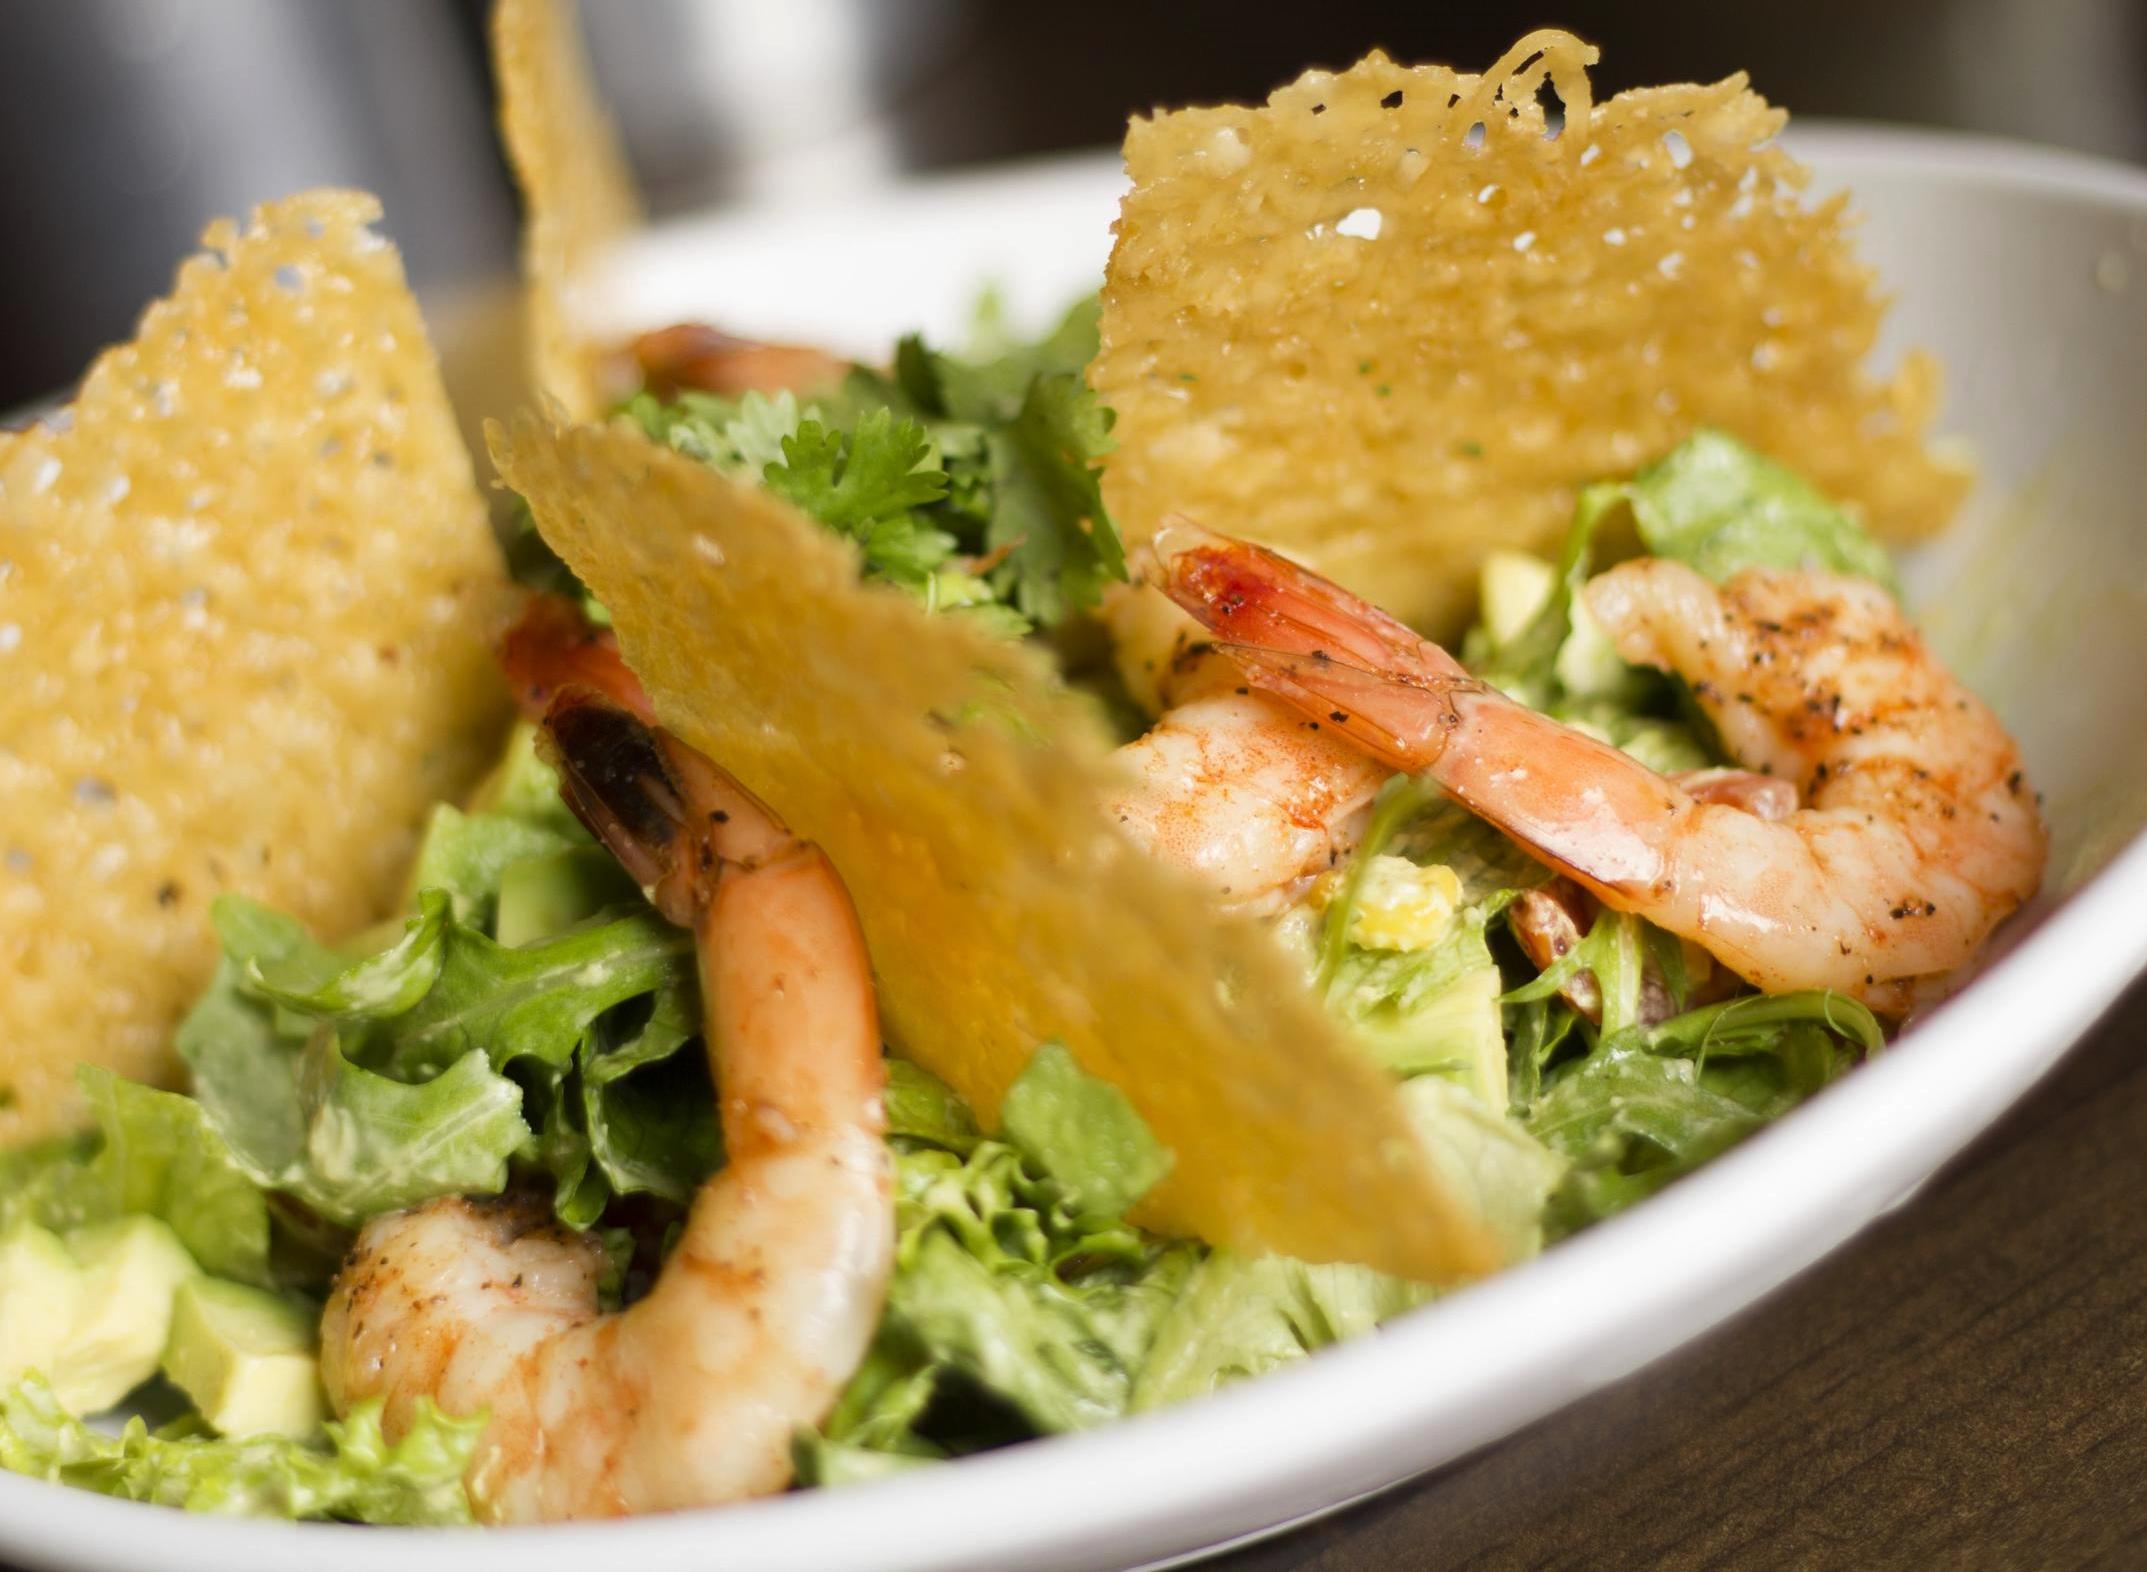 Stockyard Burgers and Bones Smoked Shrimp Salad